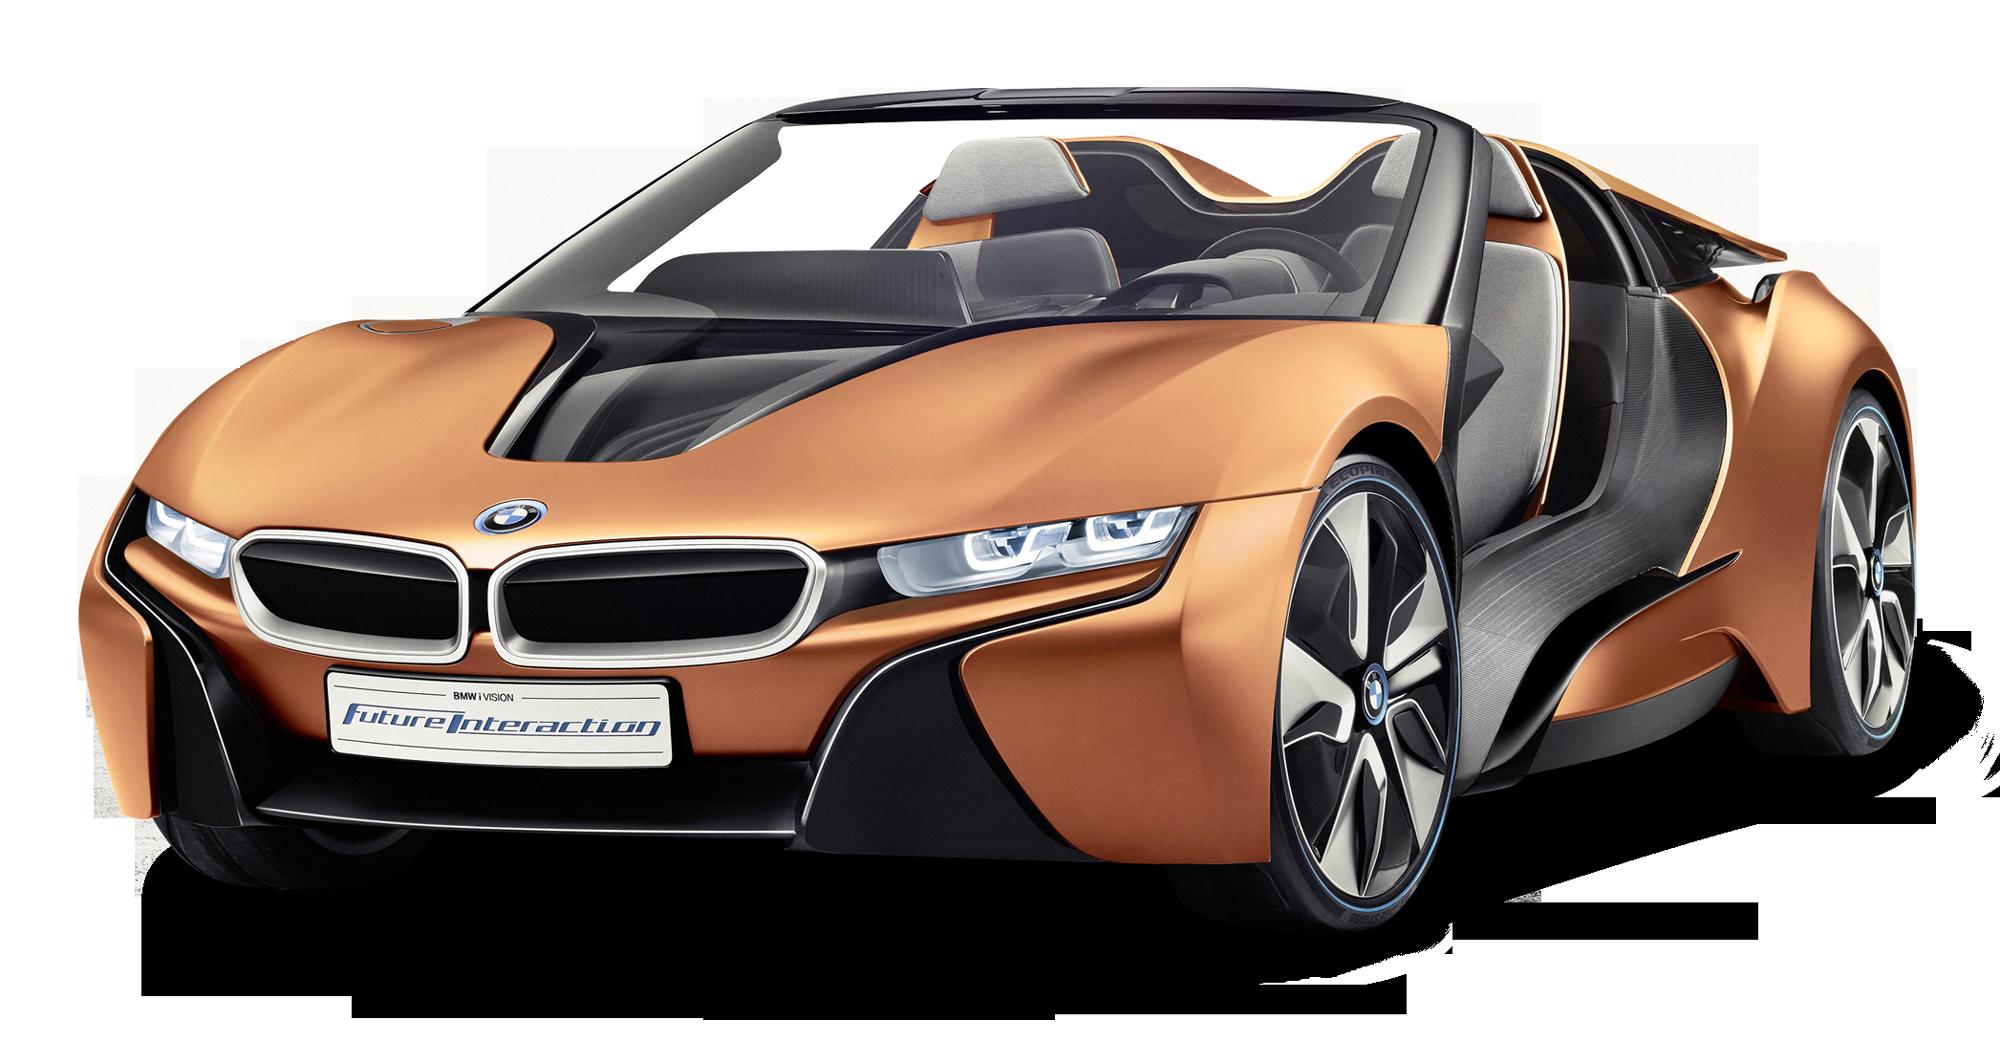 Orange Bmw I8 Spyder Car Png Image Pngpix Bmw Concept Bmw I8 Nova Bmw